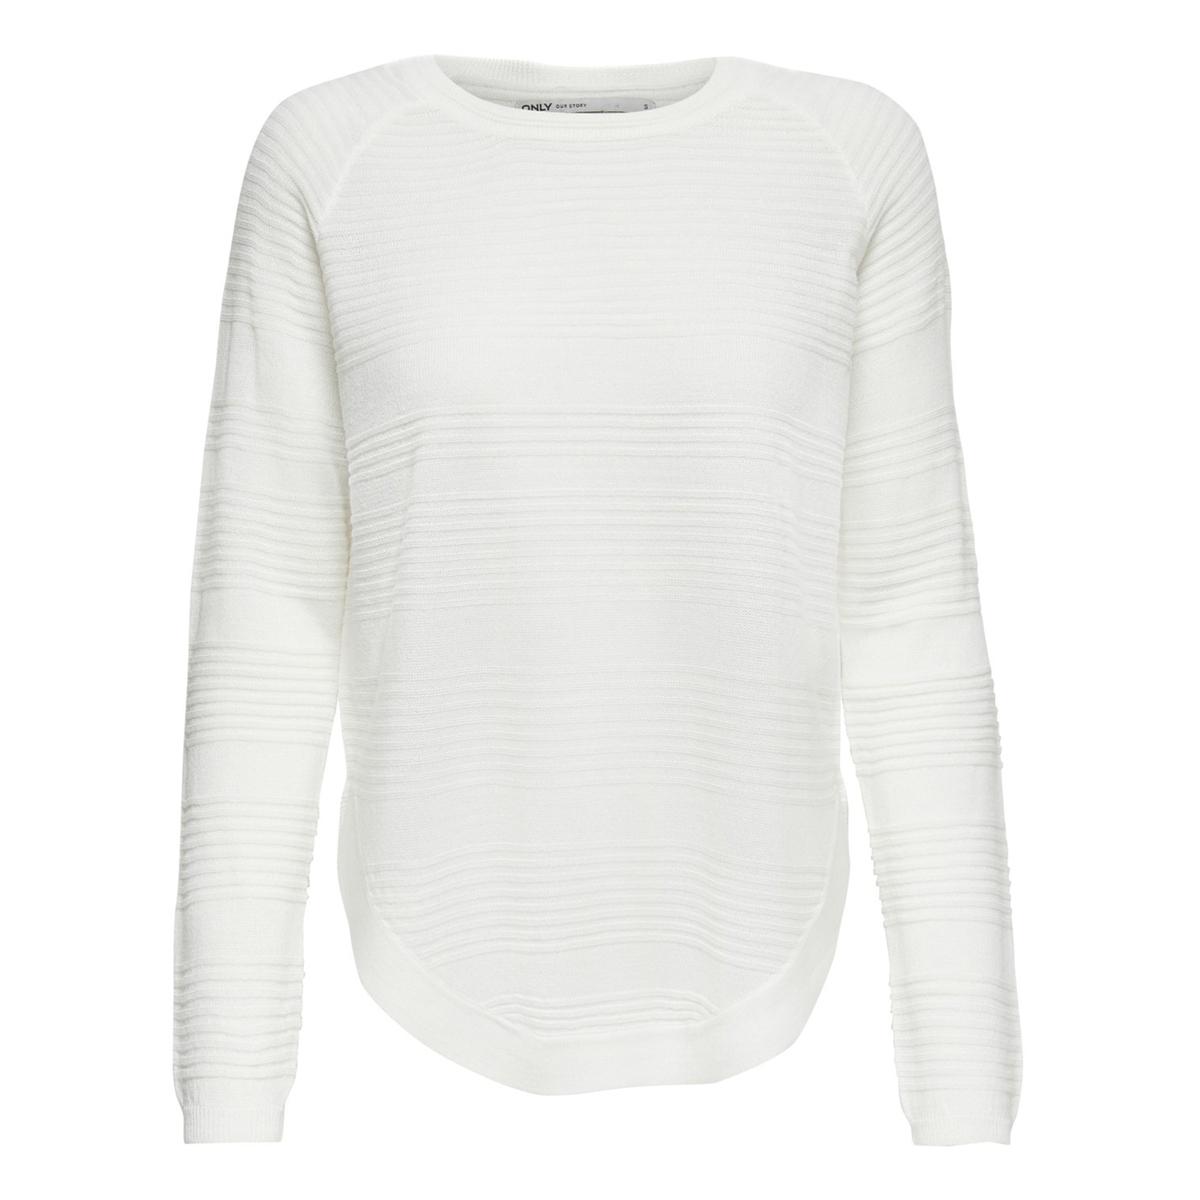 Пуловер La Redoute Из тонкого трикотажа присборенный снизу S белый